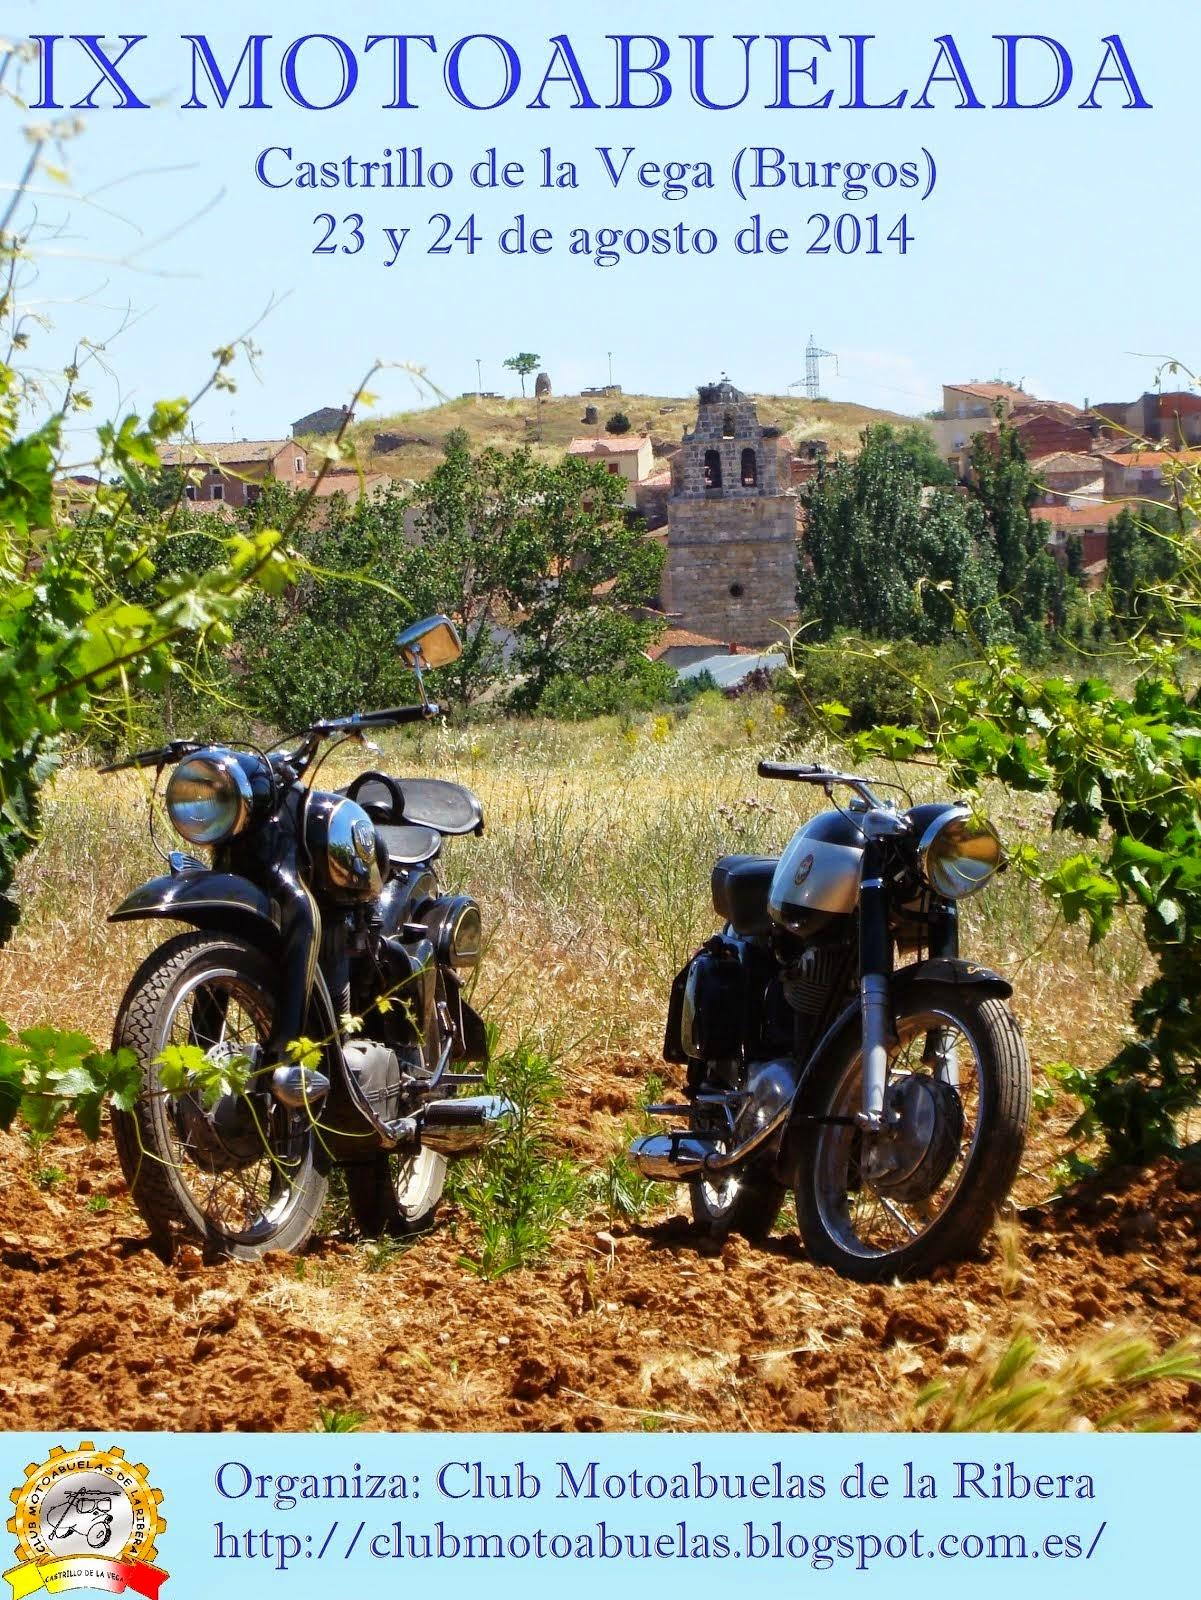 http://motoabuelada.blogspot.com.es/